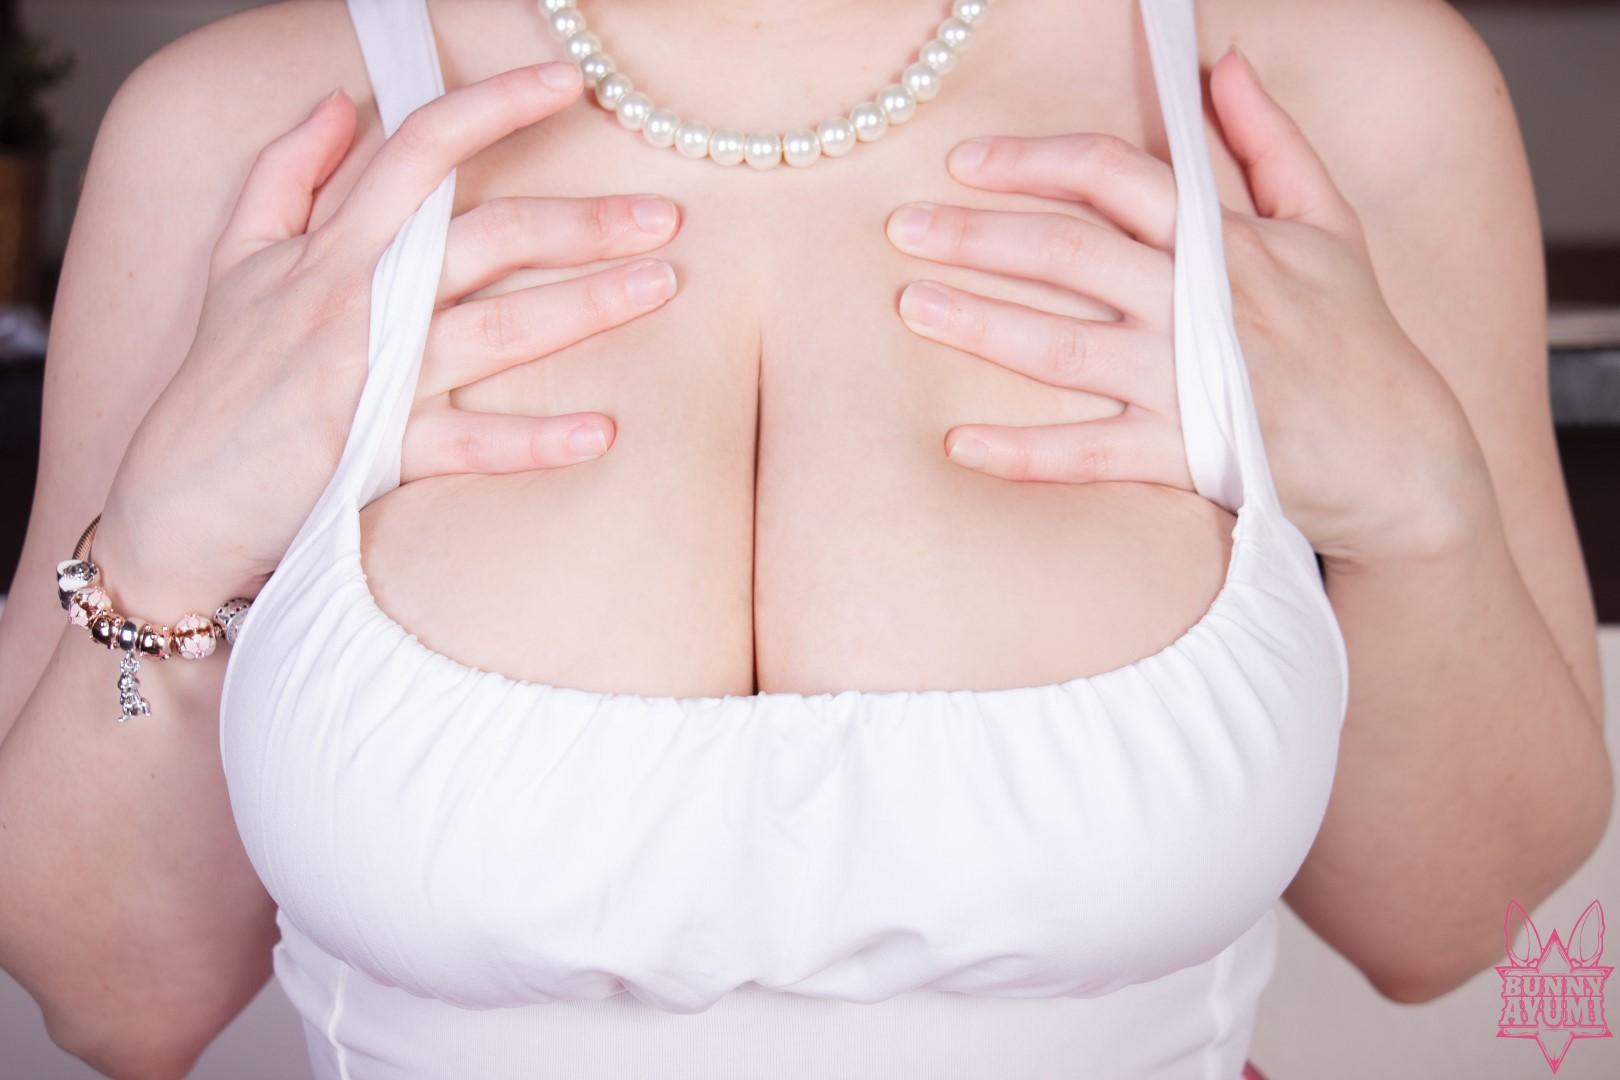 Bunny Ayumi Nude Leaked Vidoes and Naked Pics! 58